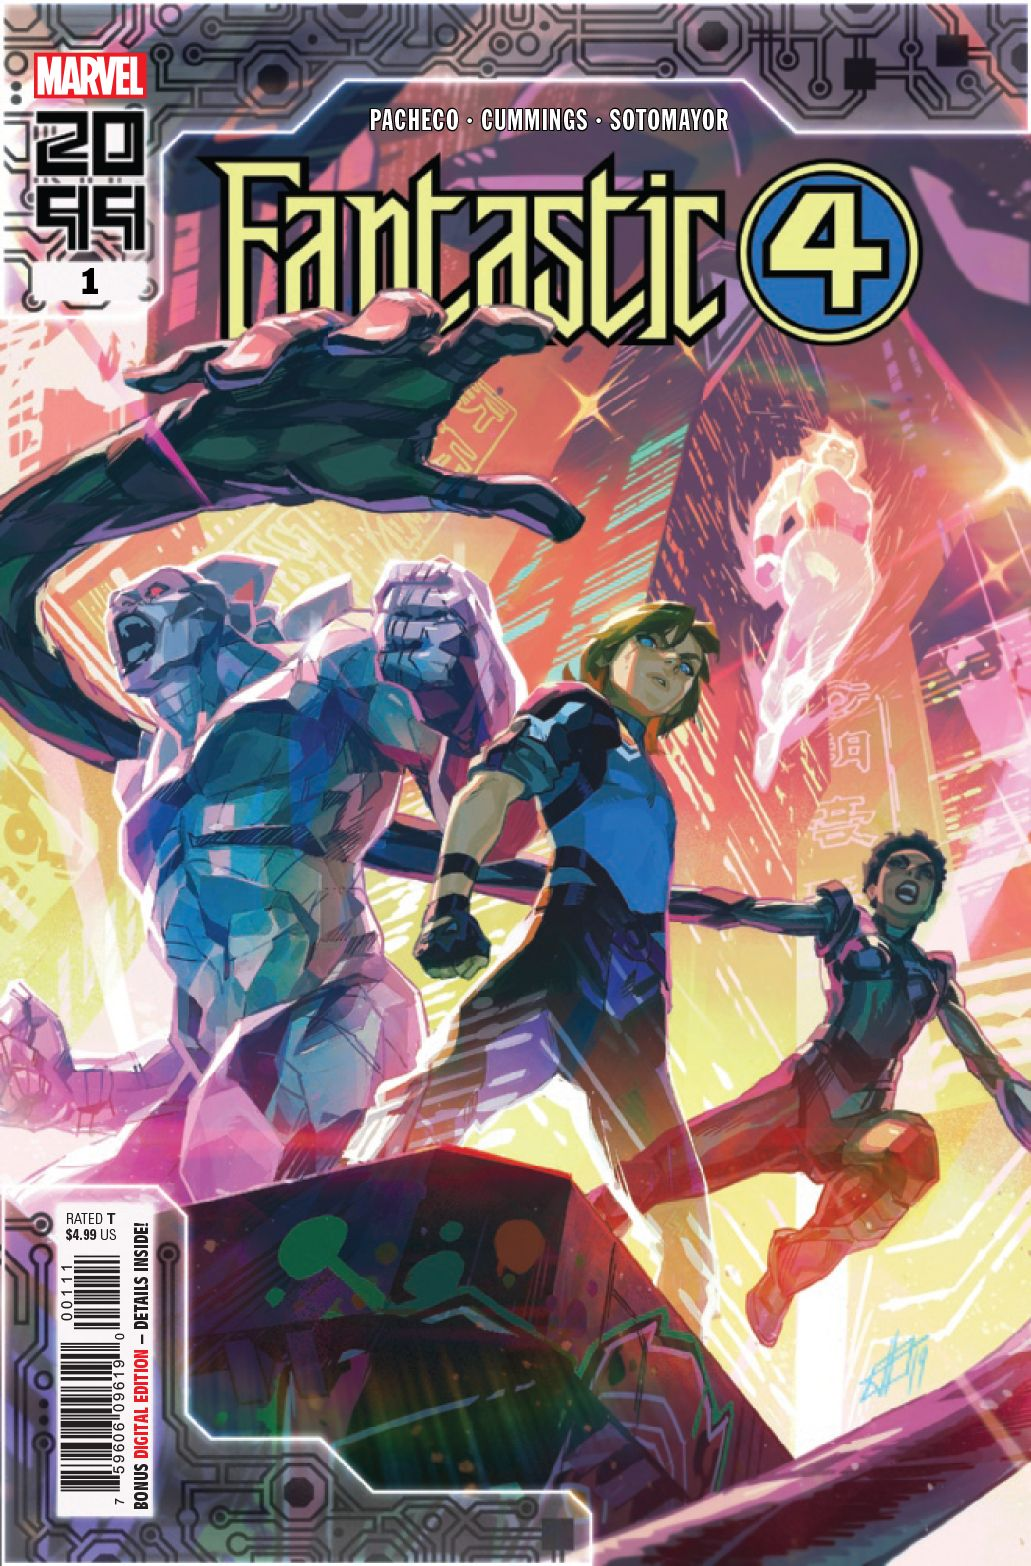 AERO #1 Cover A Marvel Comics, July 2019  NM